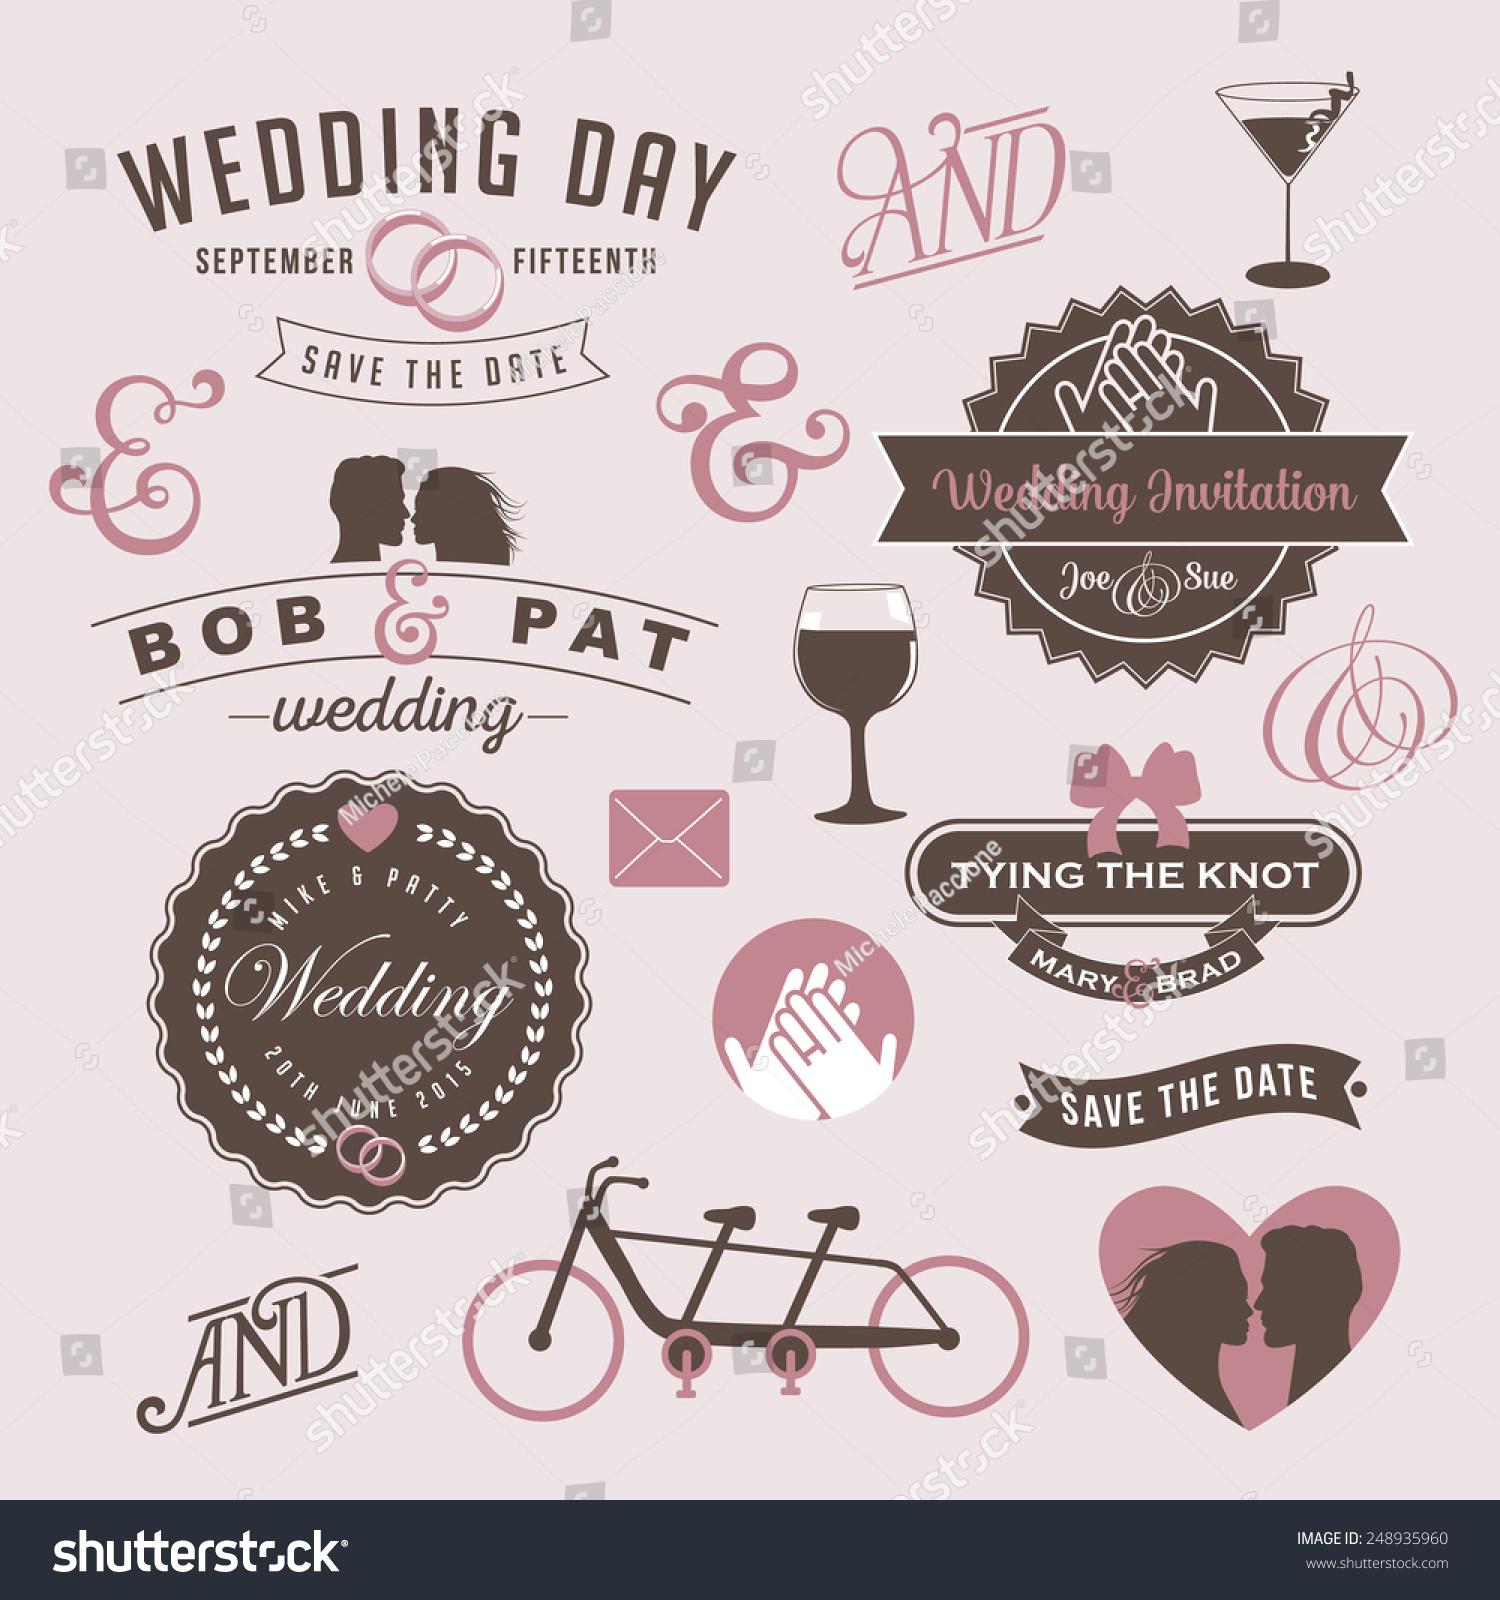 Vintage wedding invitation design graphic elements stock vector vintage wedding invitation design graphic elements eps 10 vector royalty free stock illustration stopboris Gallery